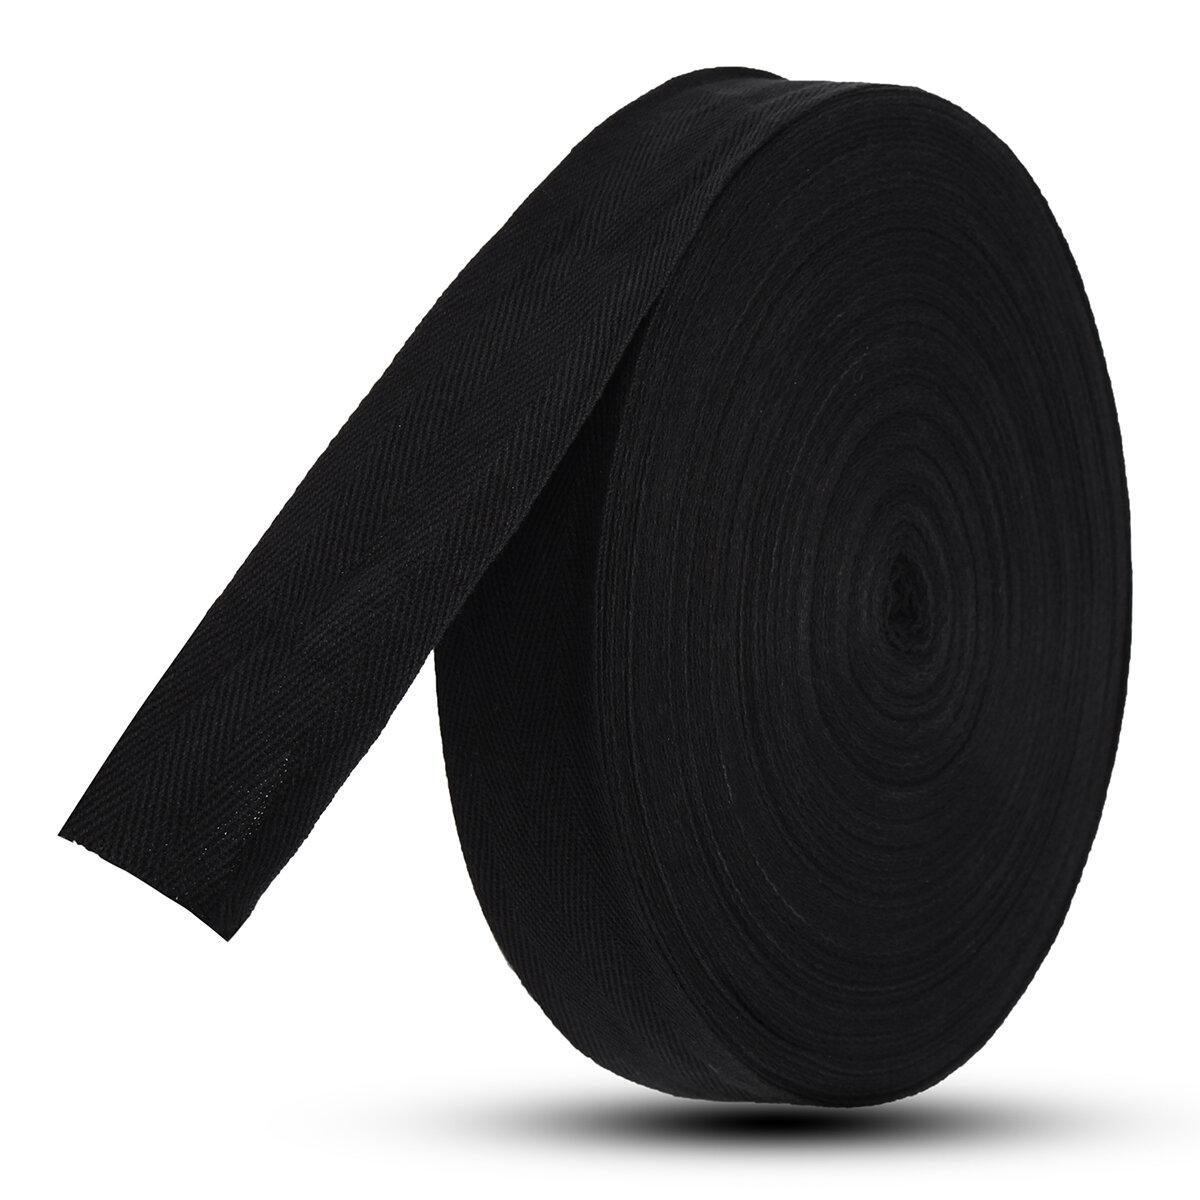 45M Cotton Tape Webbing Bag Binding Belt Fabric Strap Sewing Roll For Bunting Apron Bag Belt